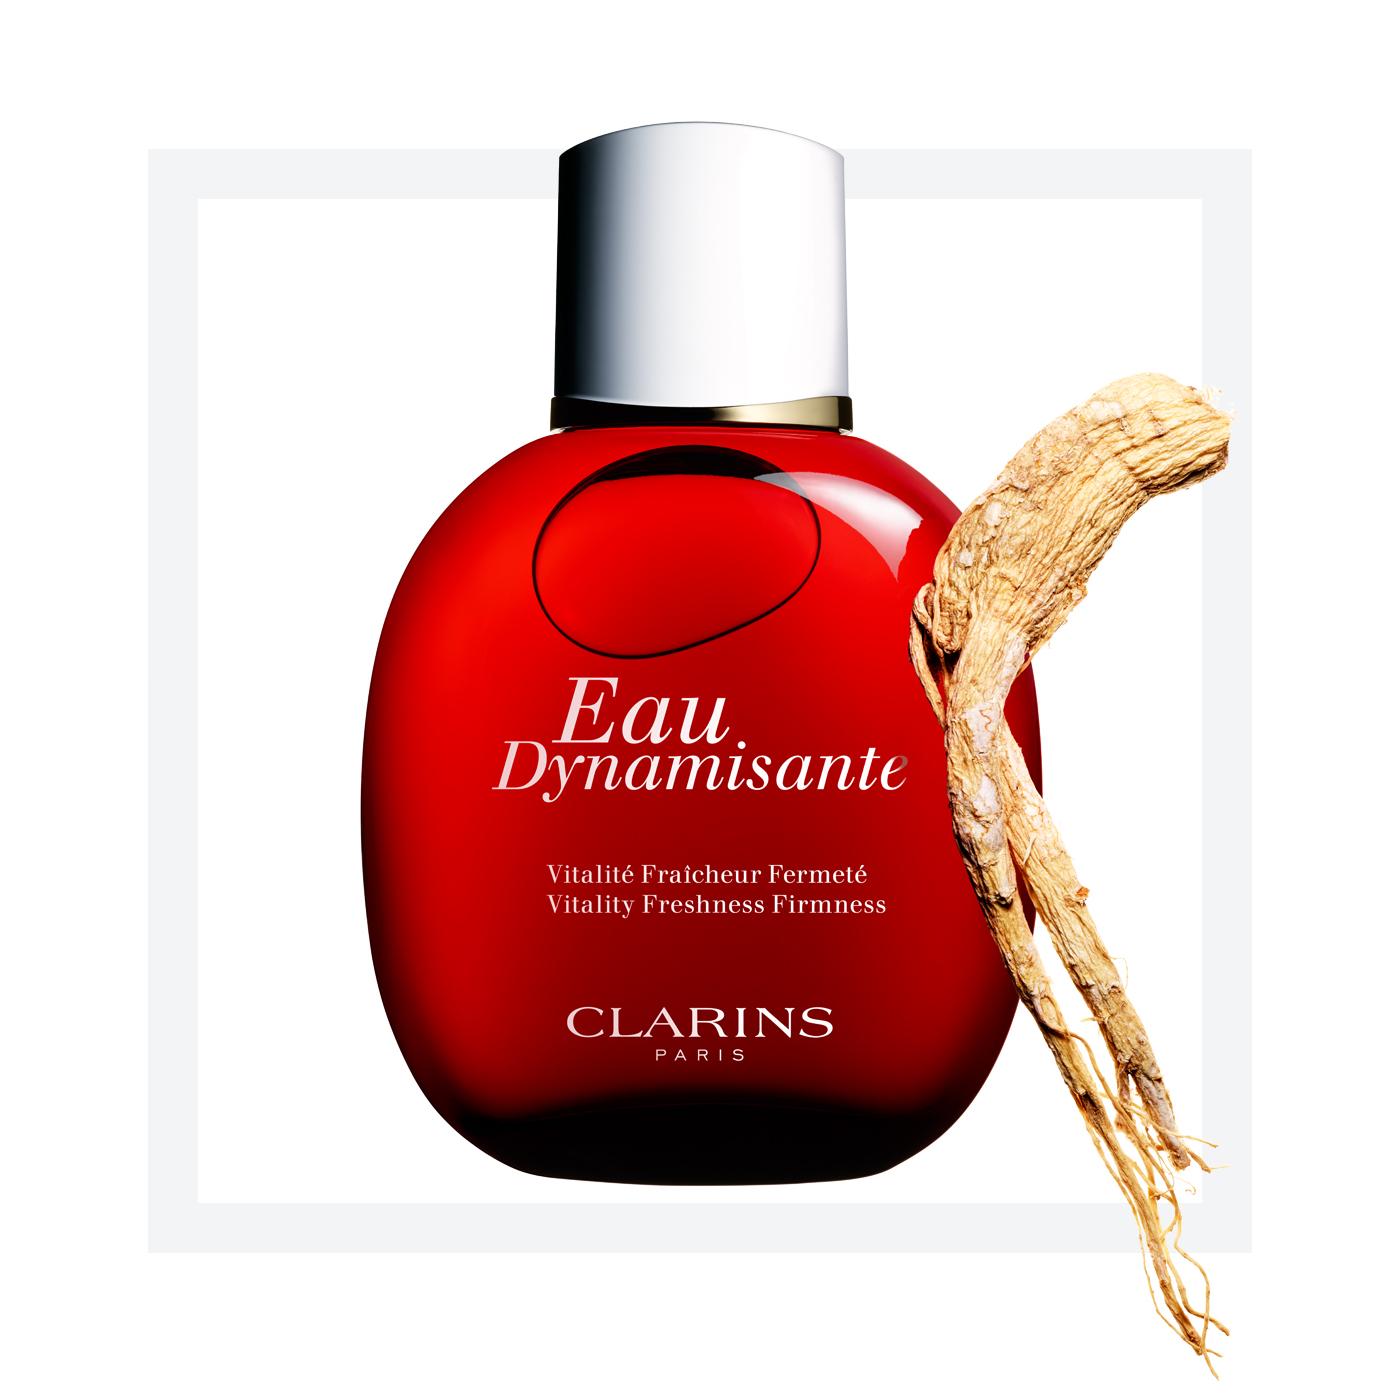 Eau Dynamisante Treatment Fragrance Hydrating Perfume Clarins Master Spray Cologne Black Musk